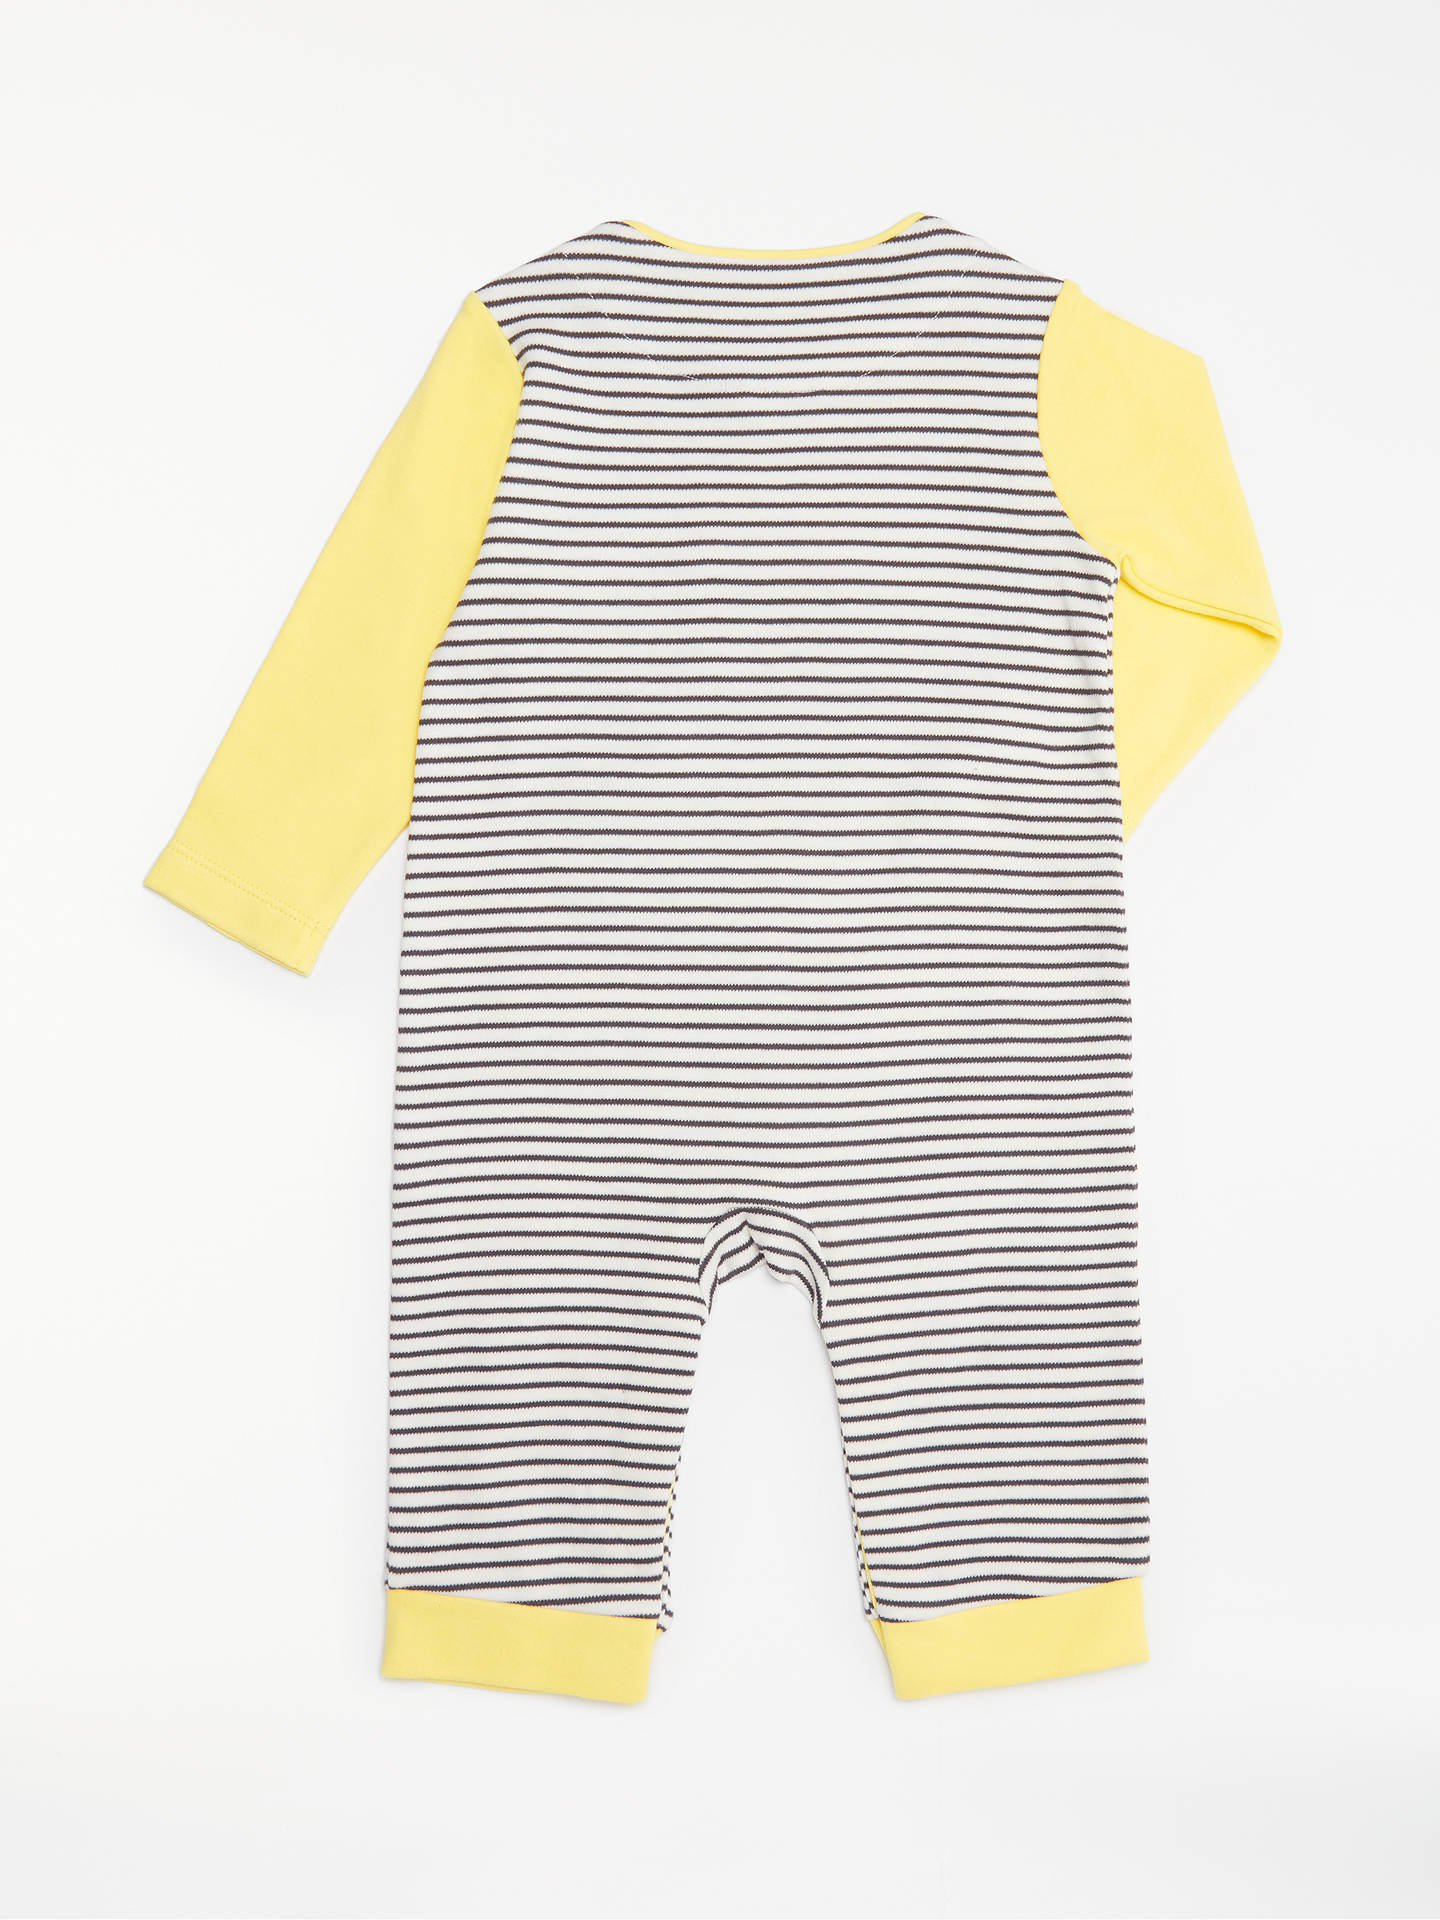 a2bb40d23 John Lewis Baby GOTS Organic Cotton Stripe Bunny Long Sleeve Romper ...